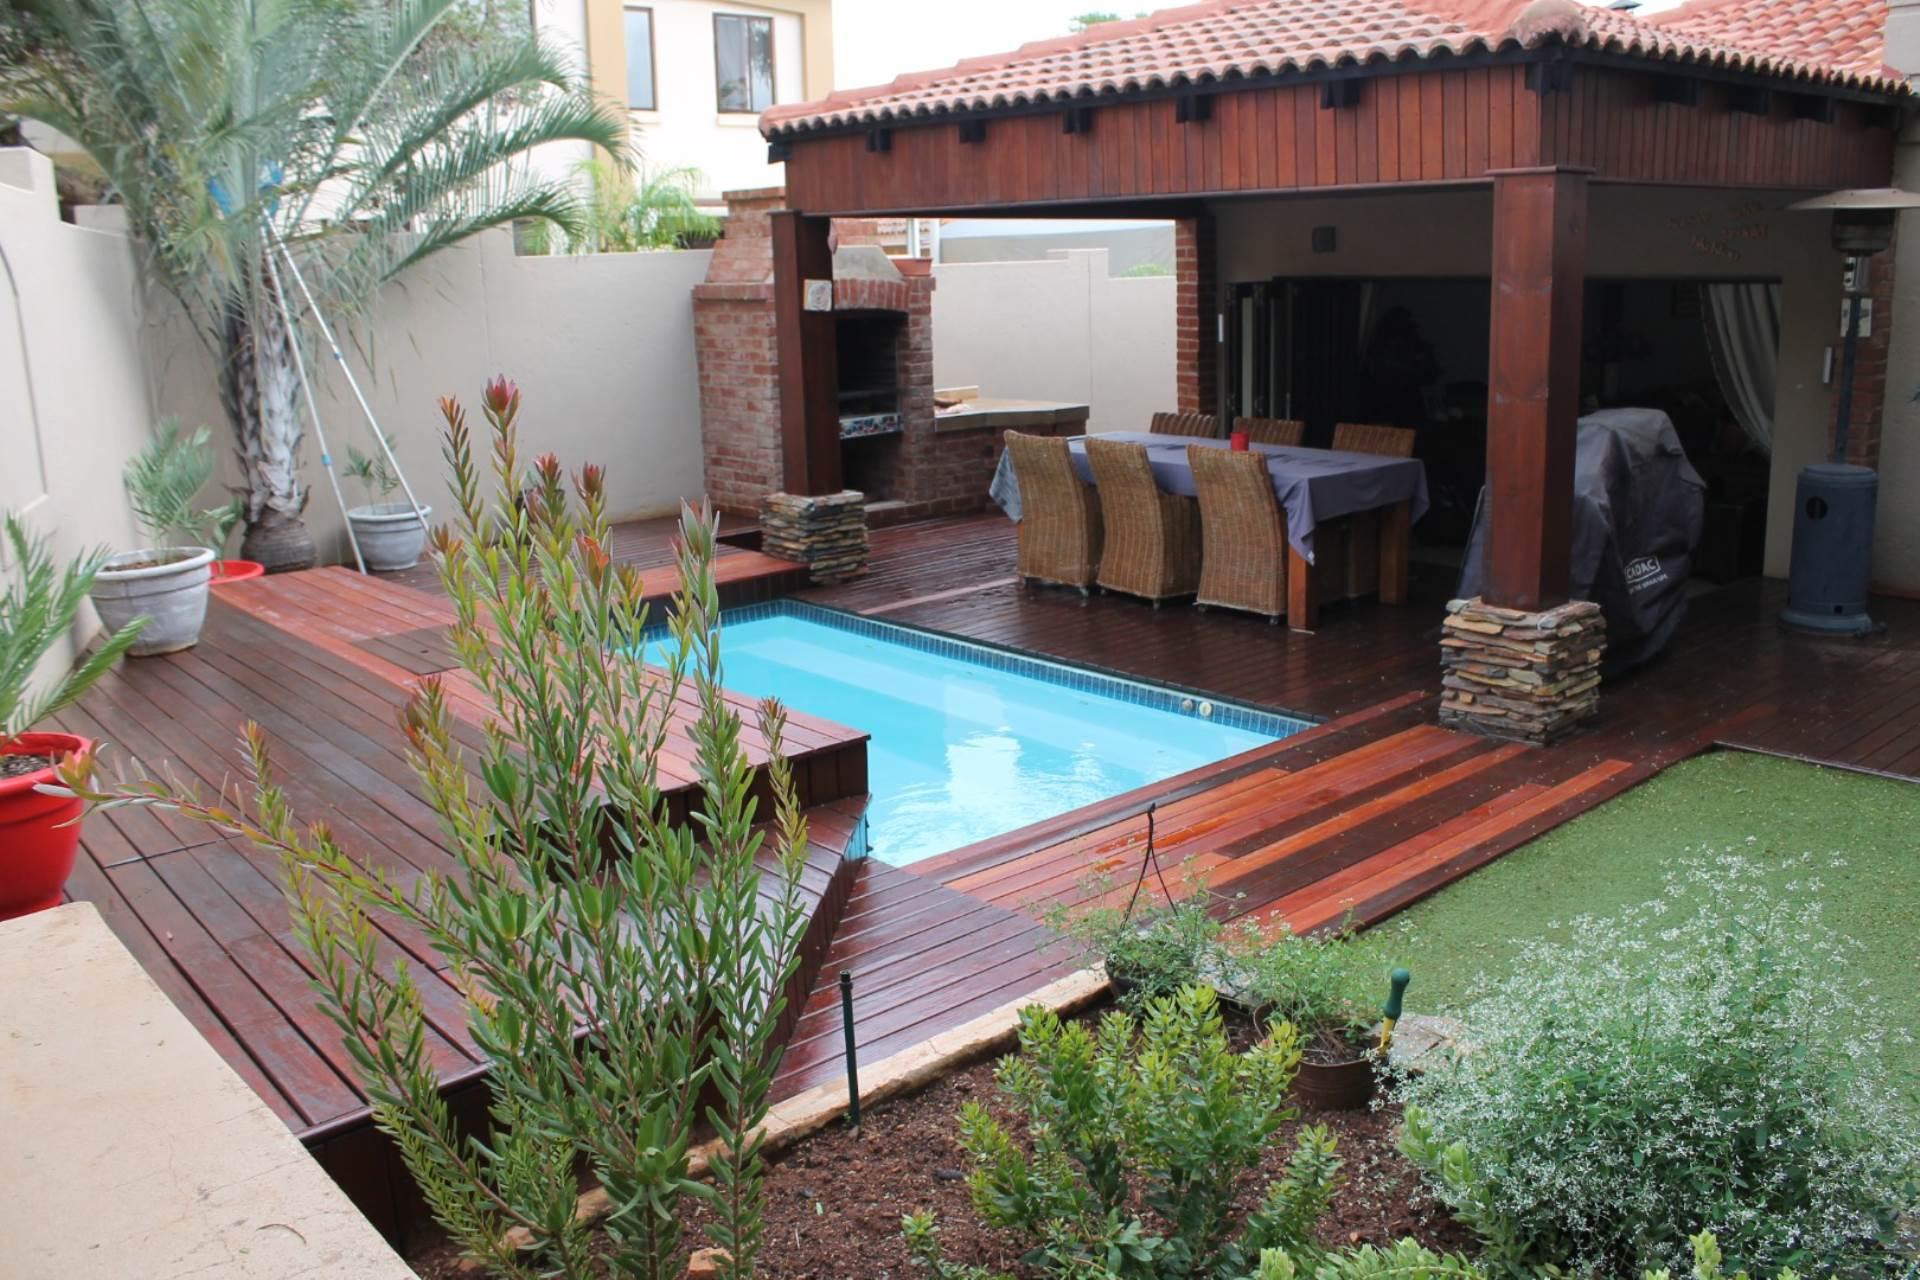 Akasia, Ninapark Property  | Houses For Sale Ninapark, NINAPARK, House 4 bedrooms property for sale Price:2,048,000